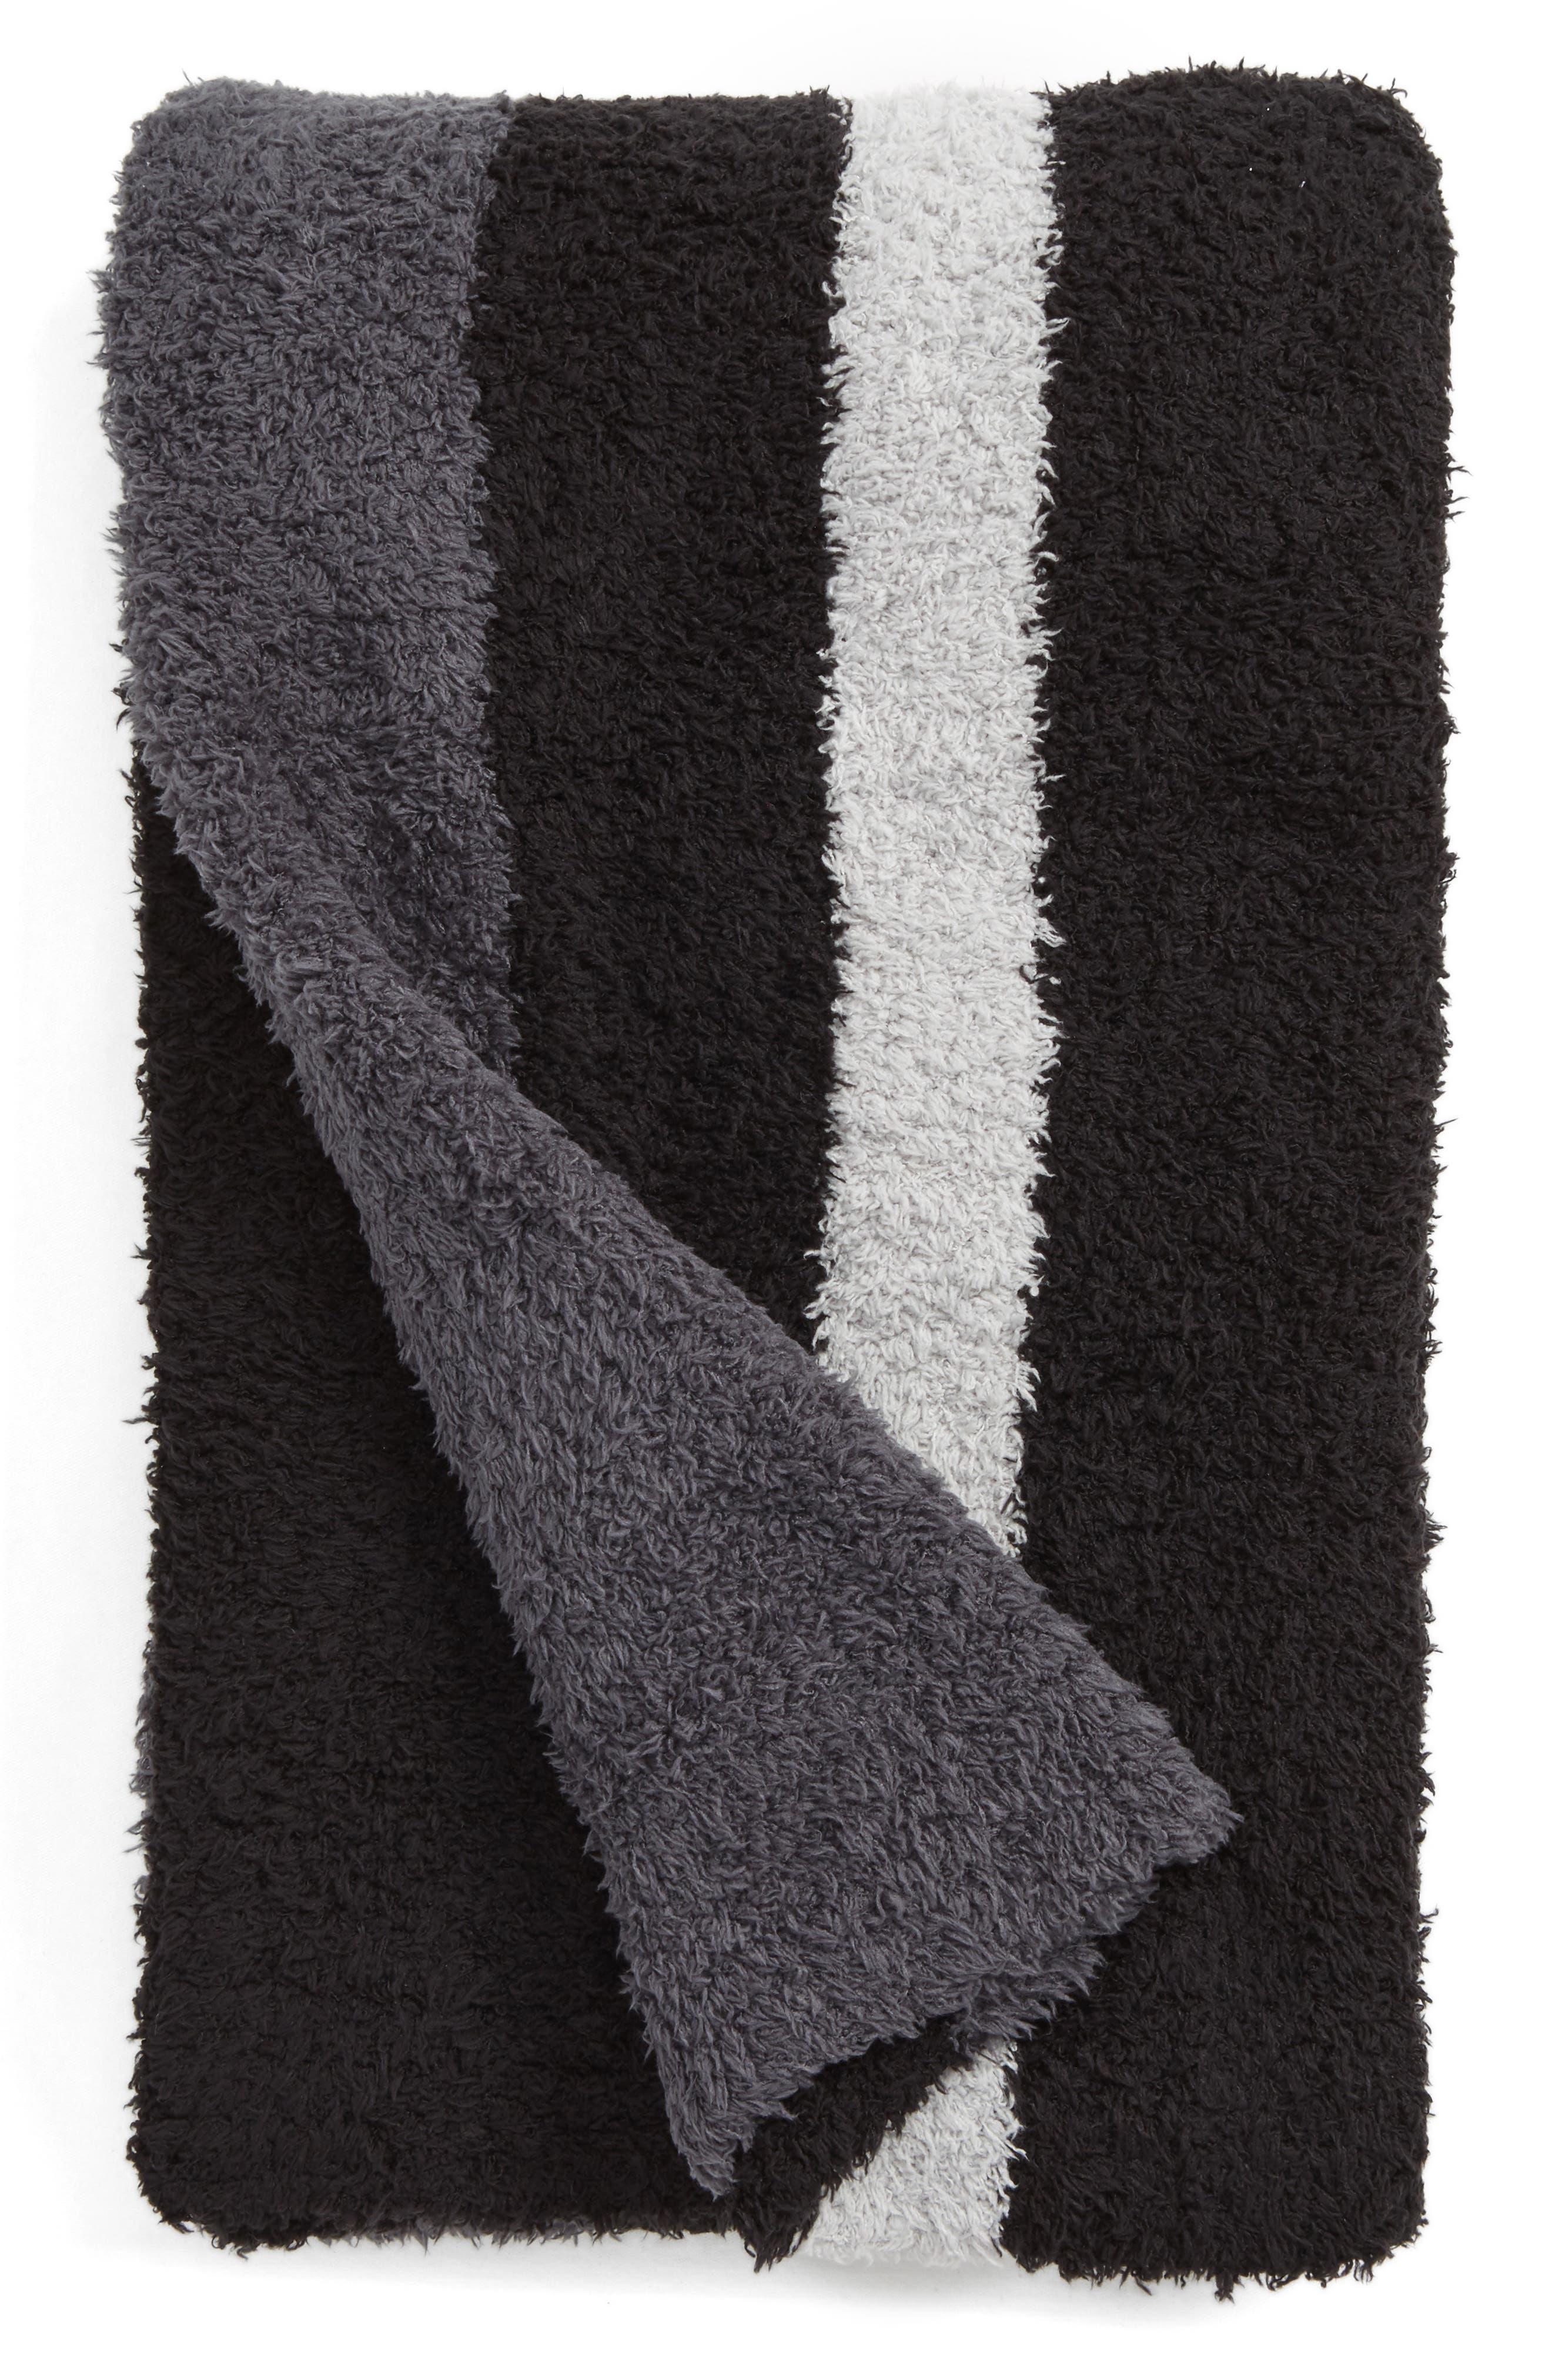 Main Image - Barefoot Dreams® Cozychic® Block Stripe Throw Blanket